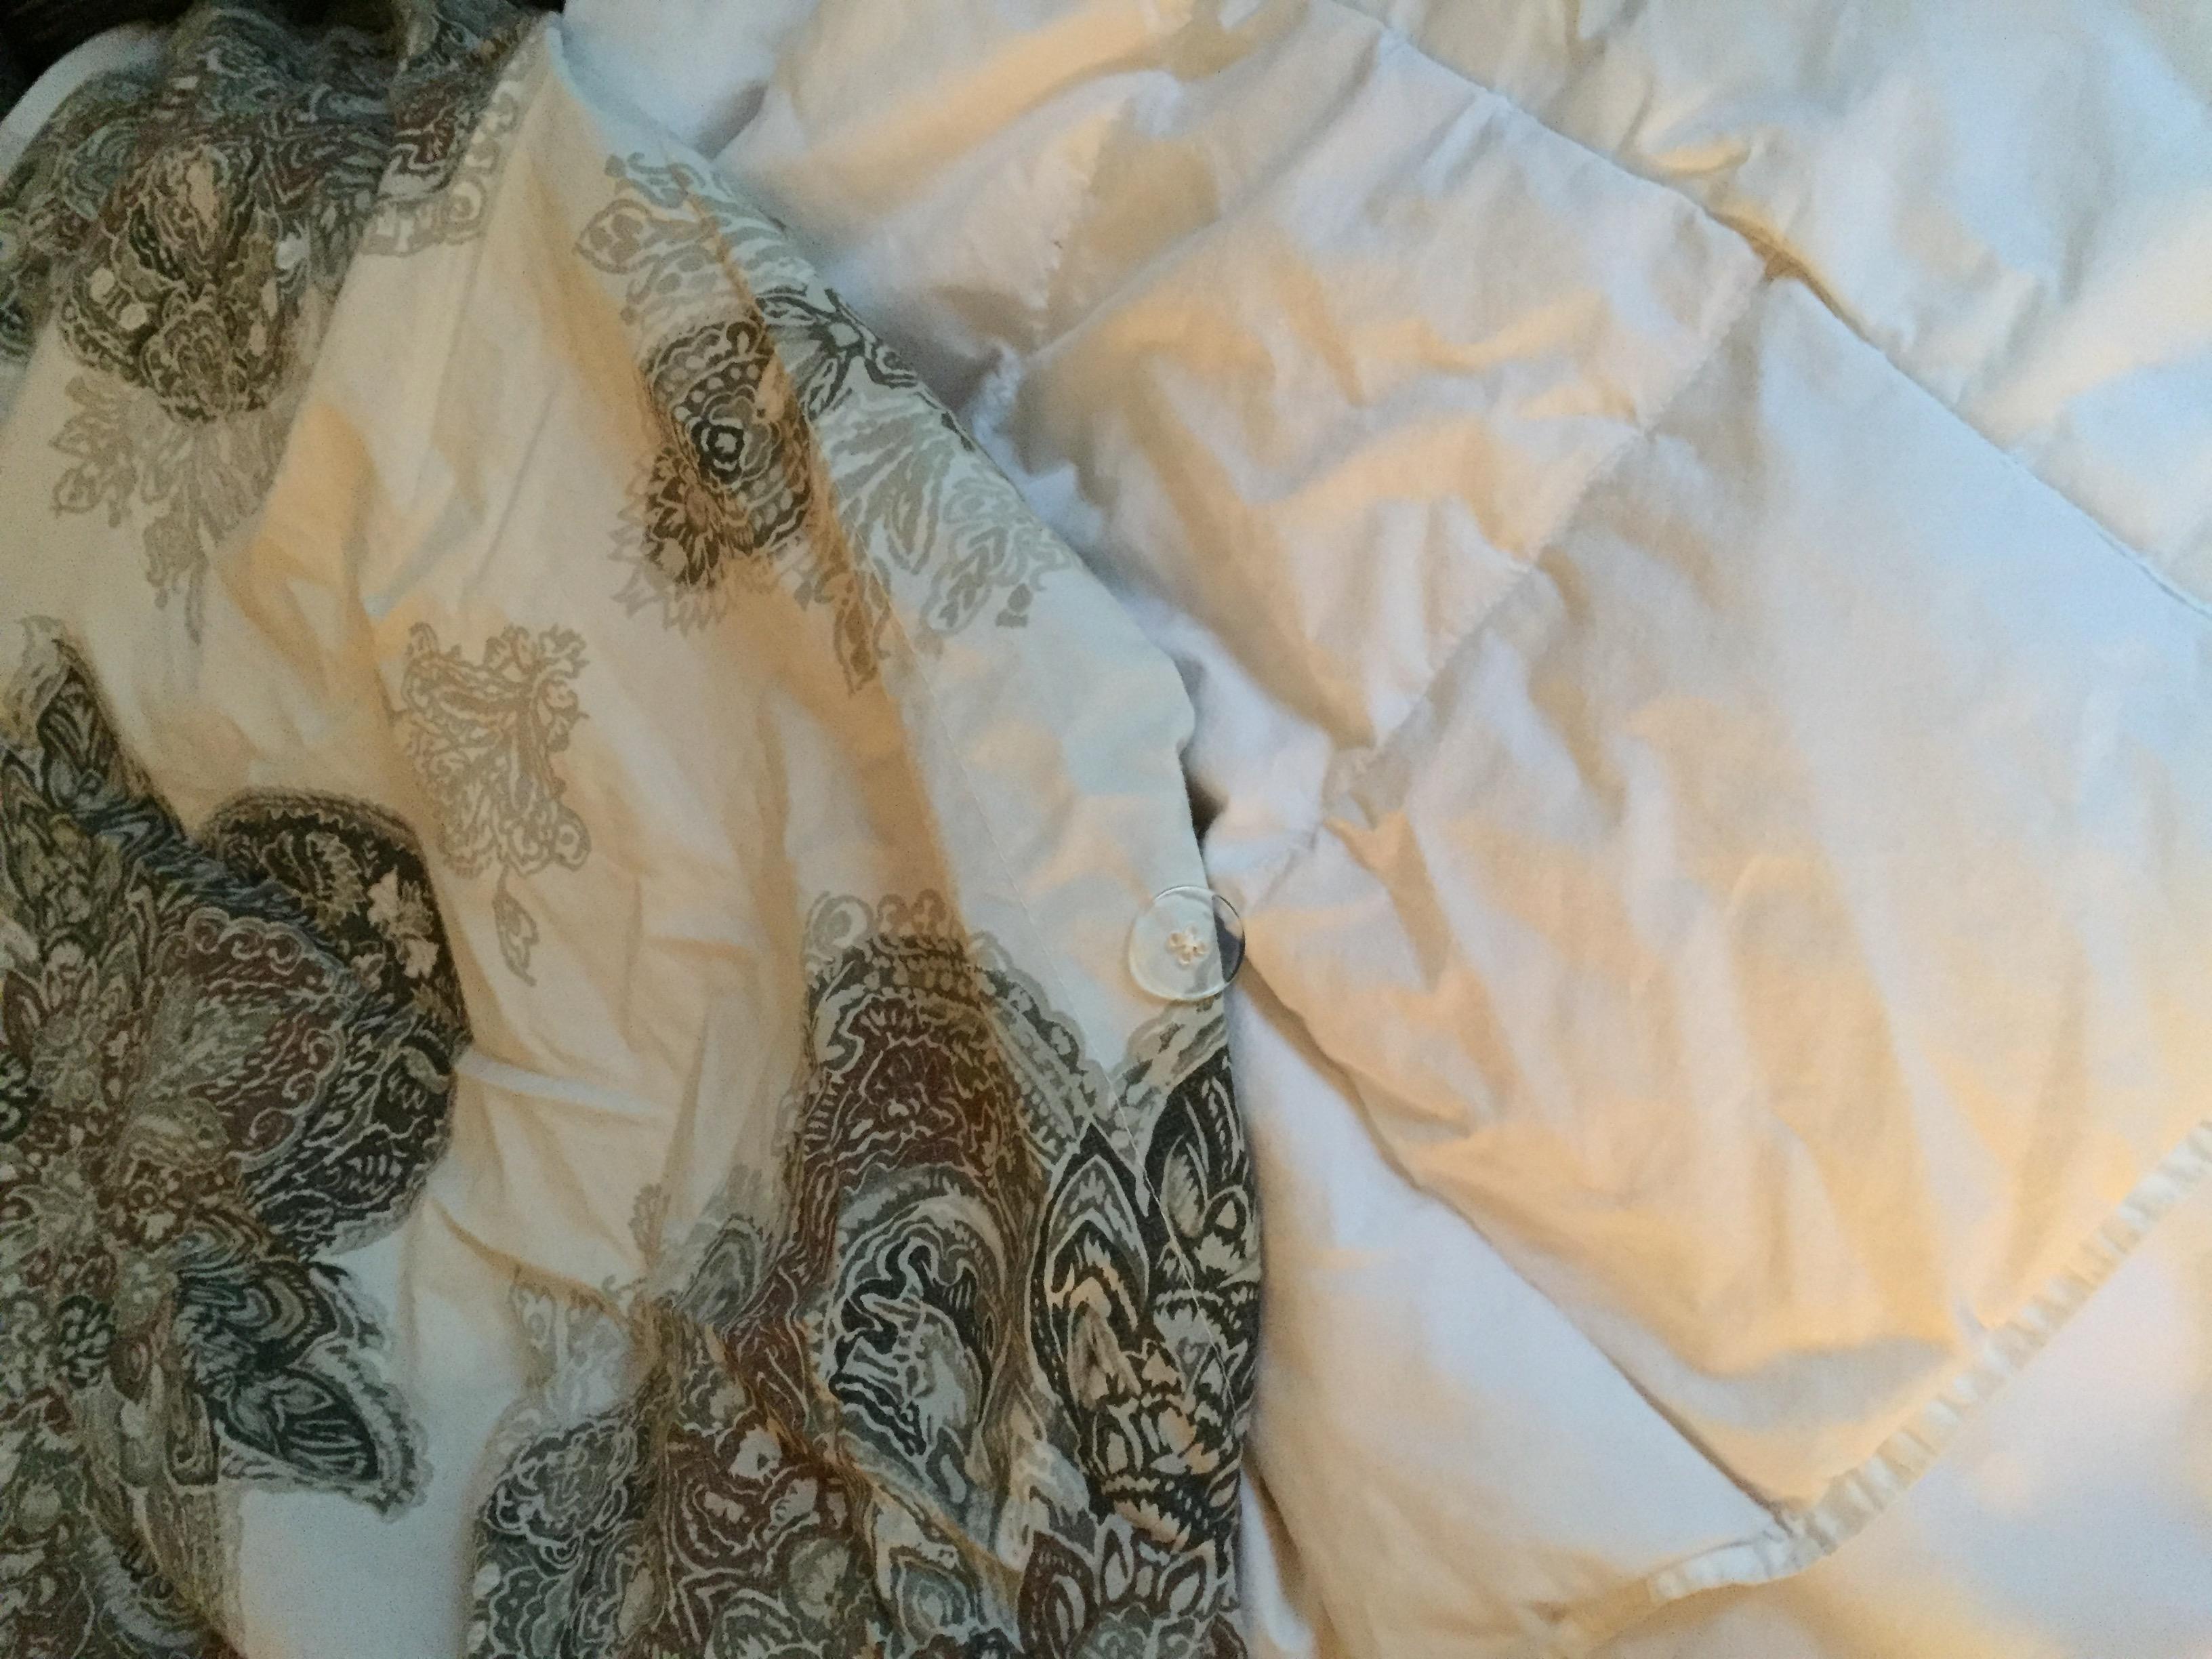 Down Comforter in a duvet.